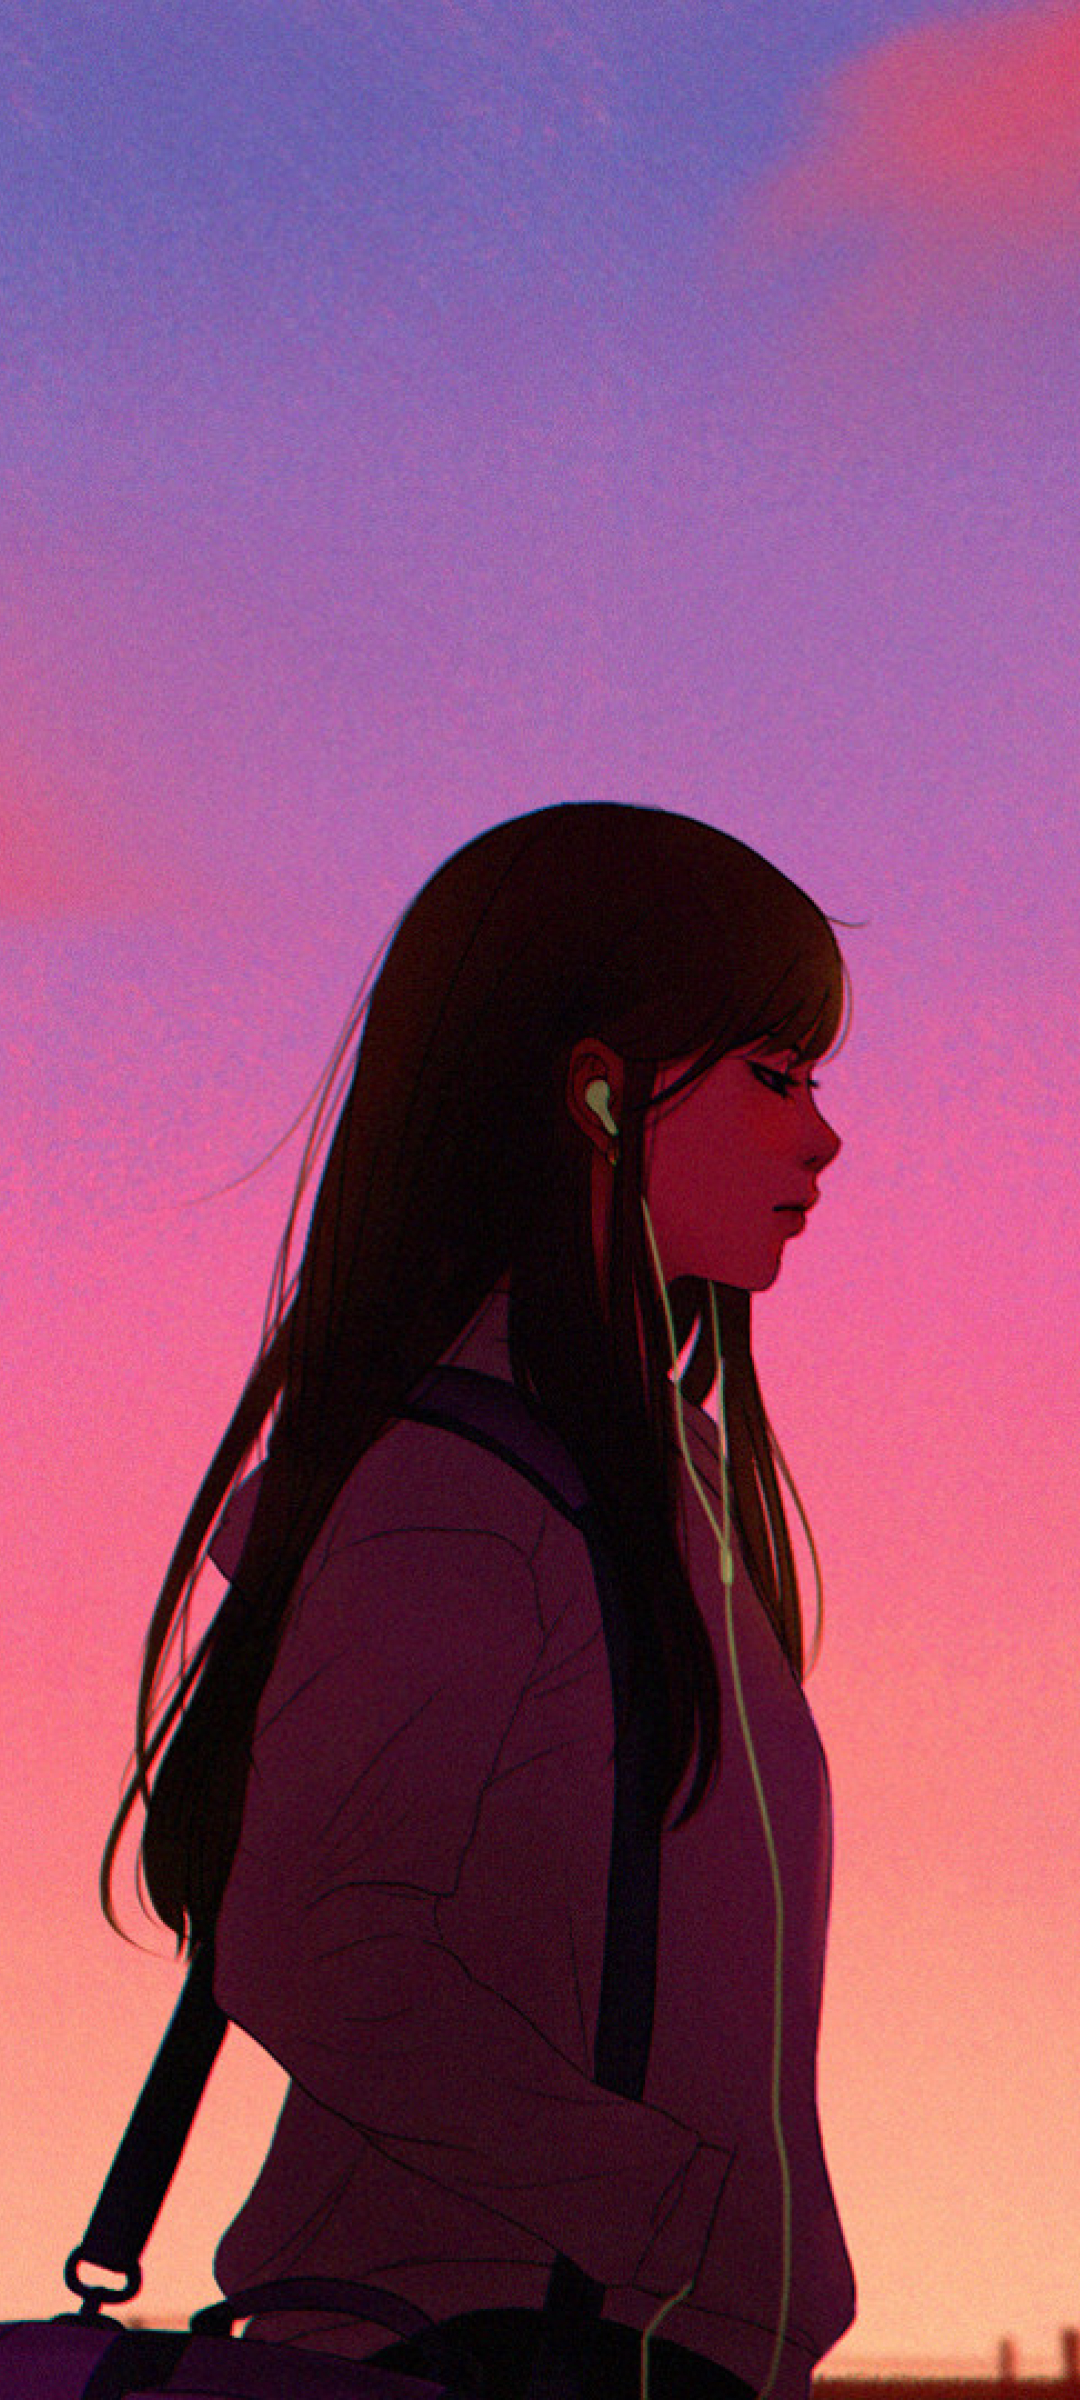 1080x2400 Anime Girl Listening Music 1080x2400 Resolution ...